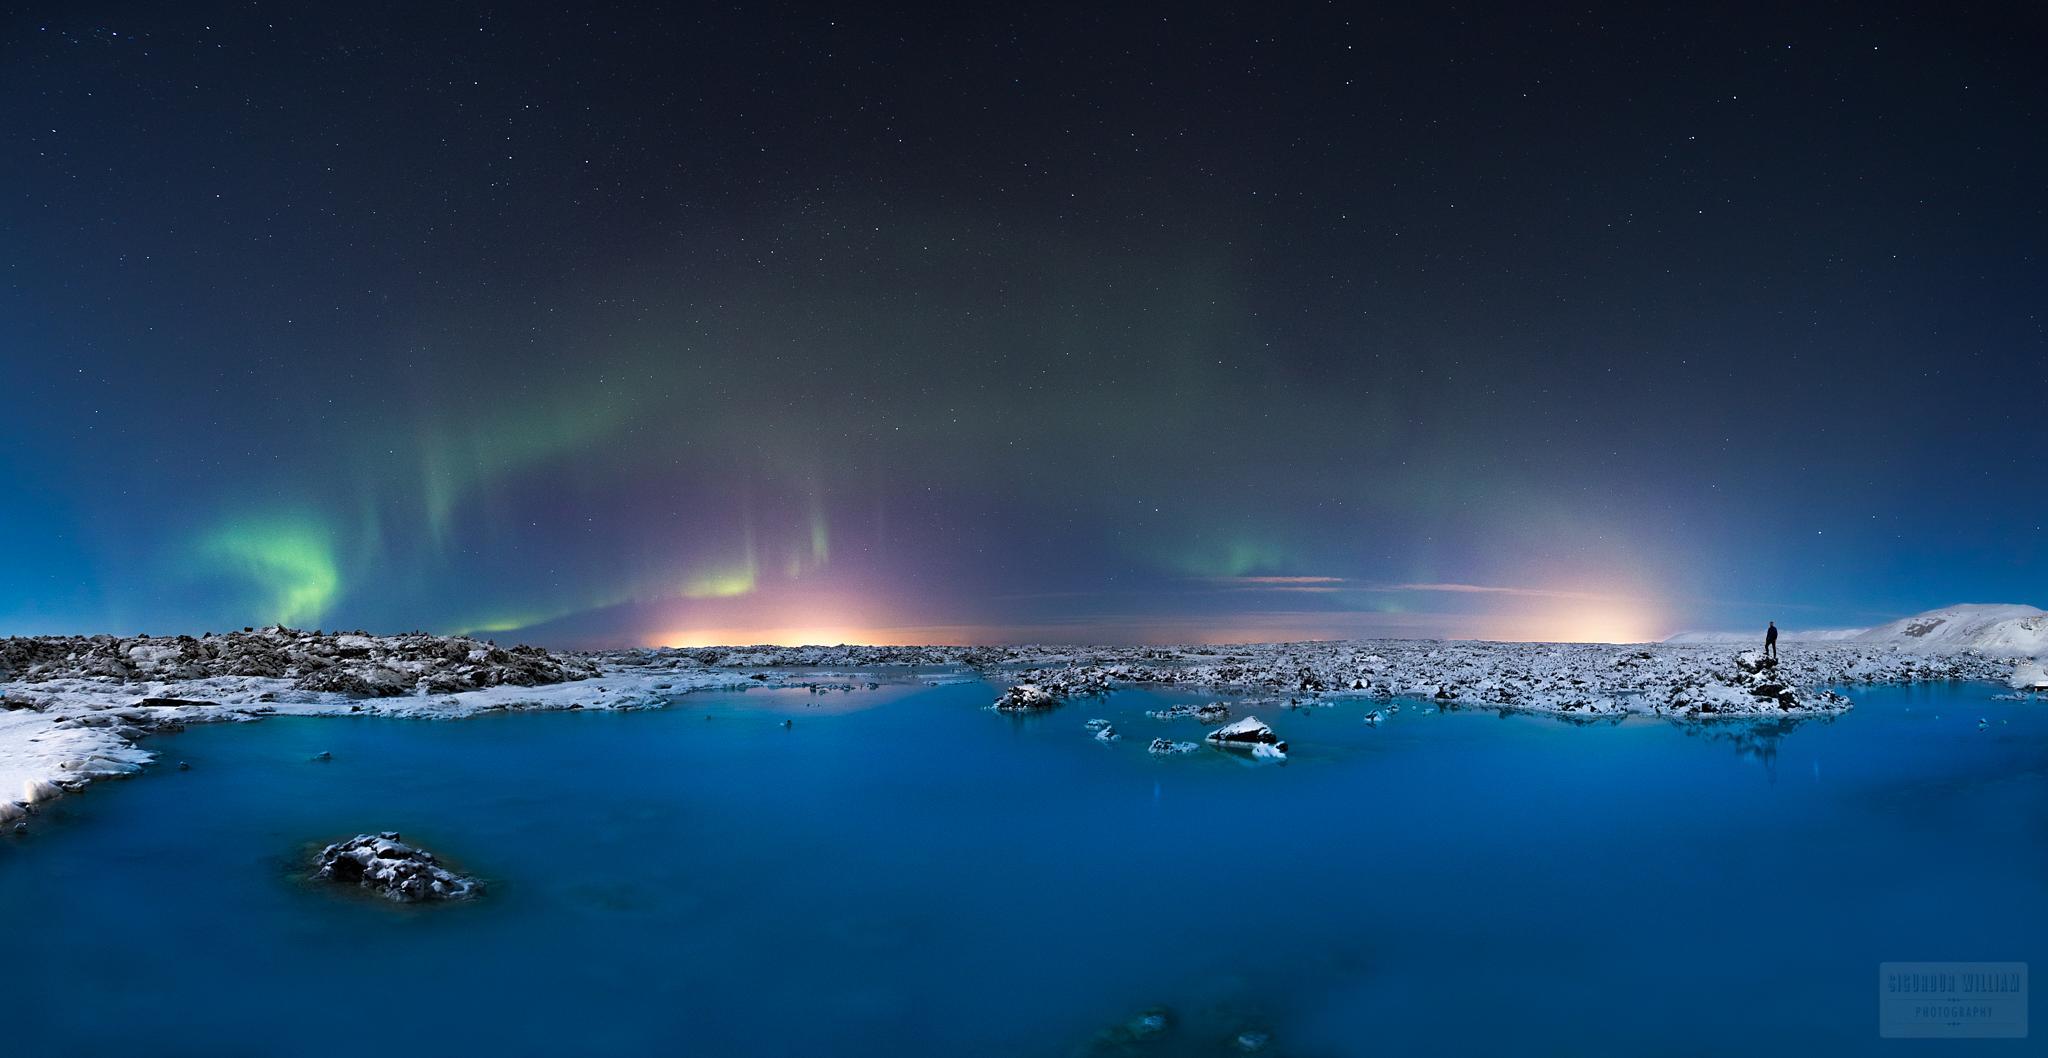 Pro selfie at the Blue Lagoon by Sigurdur William Brynjarsson